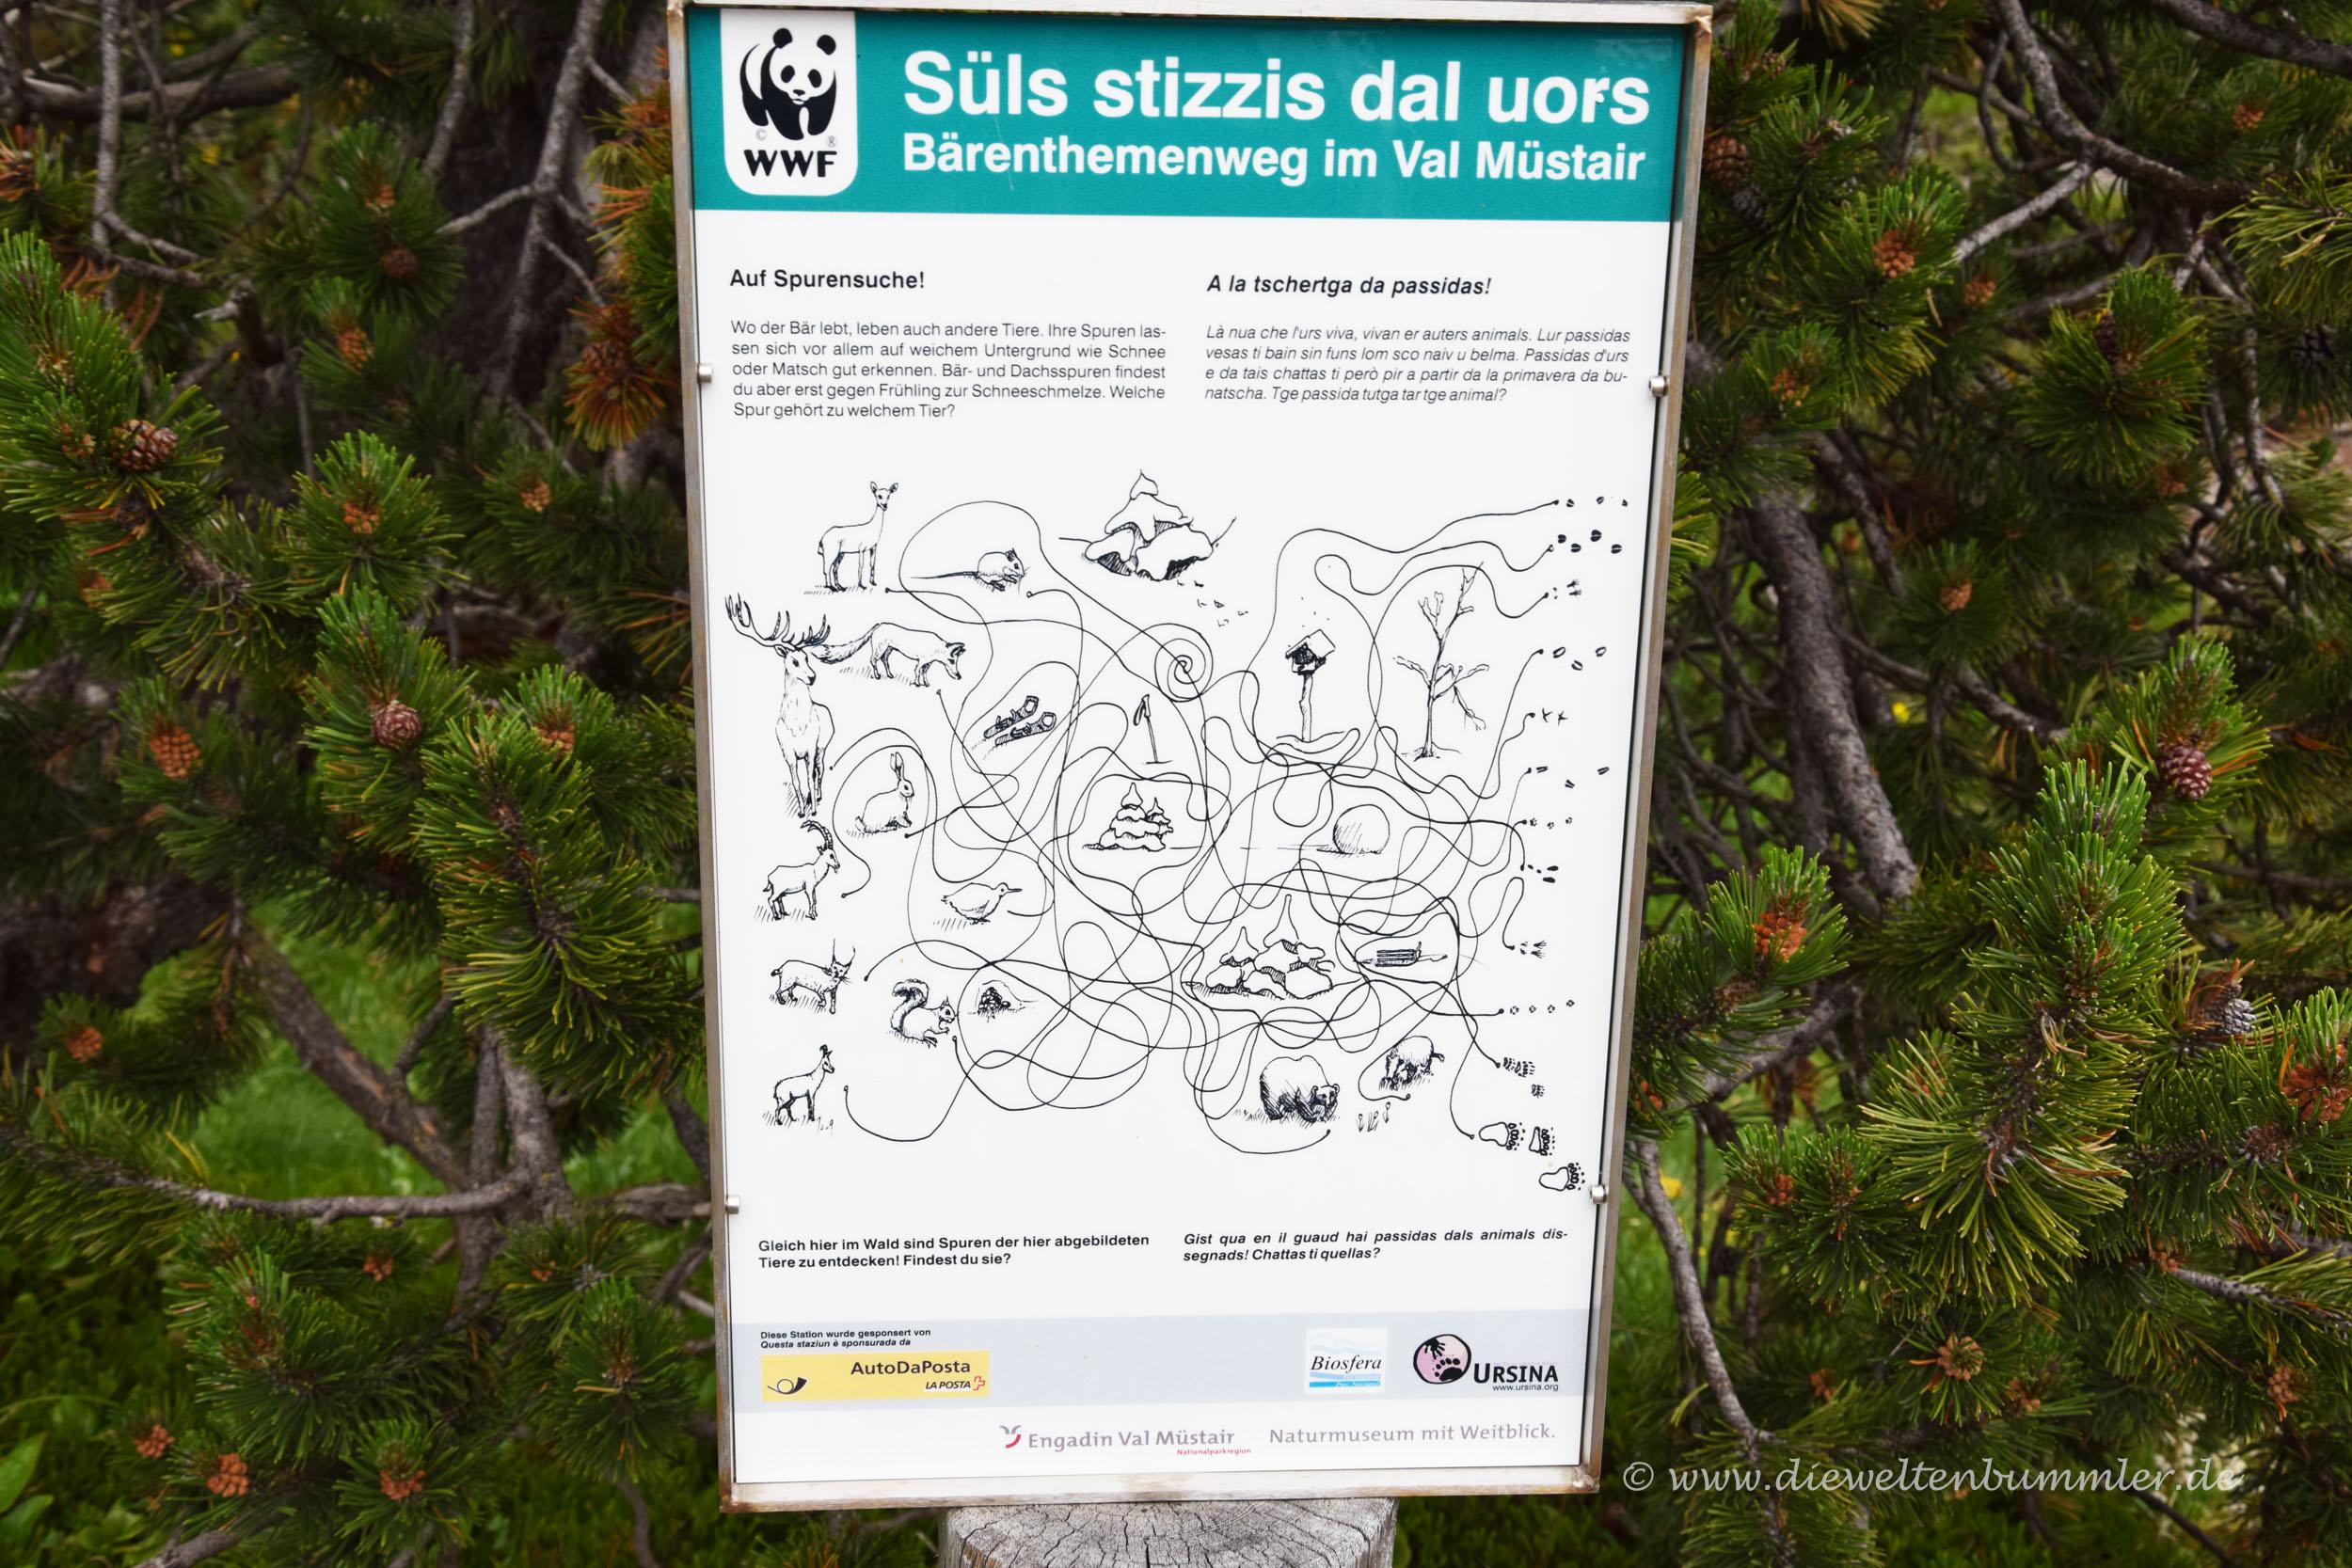 Bären-Themen-Wanderweg